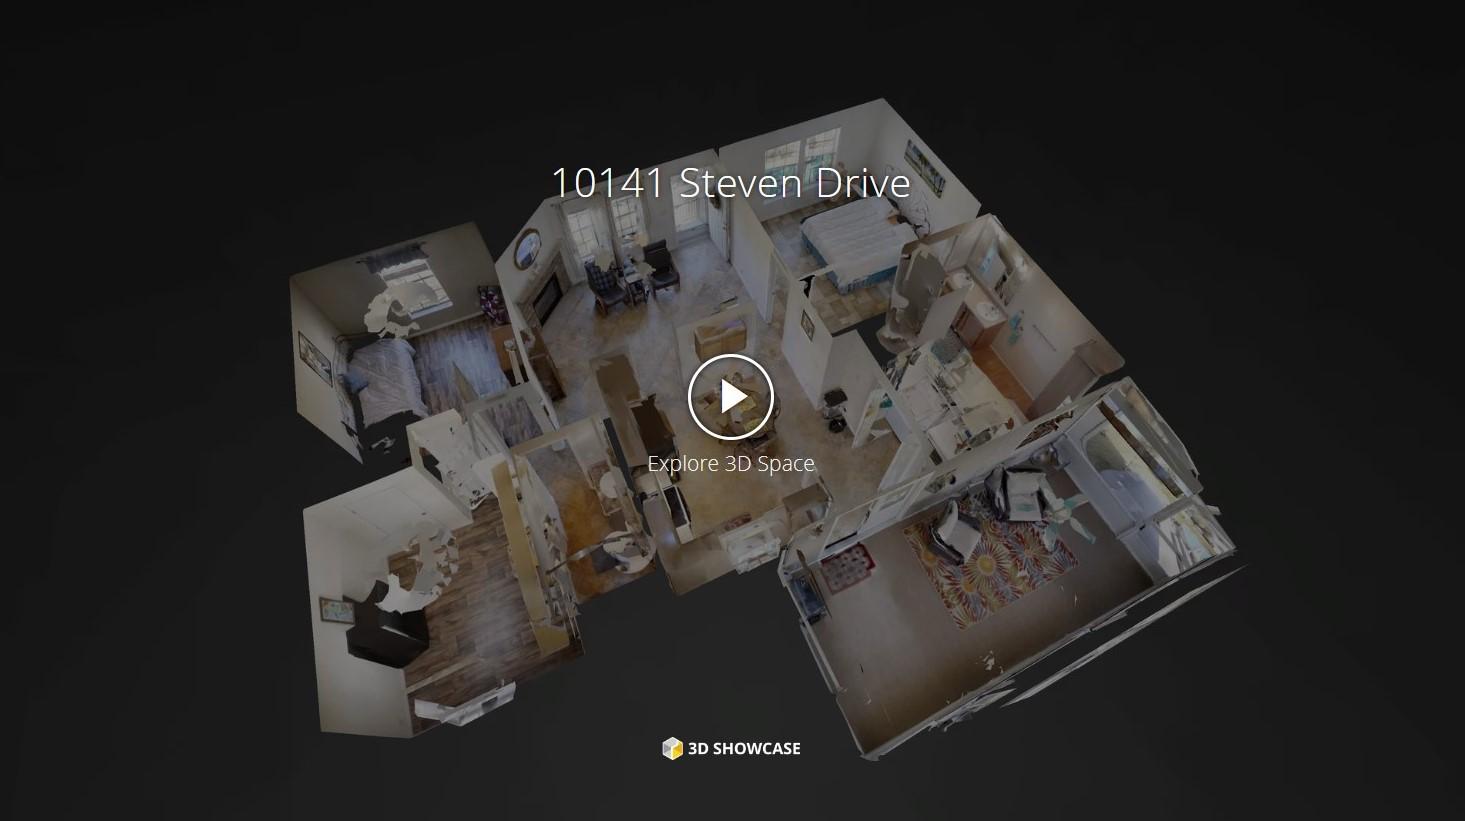 10141 Steven Drive - 1 Acre w/ Pool, RV Carport, And Workshop